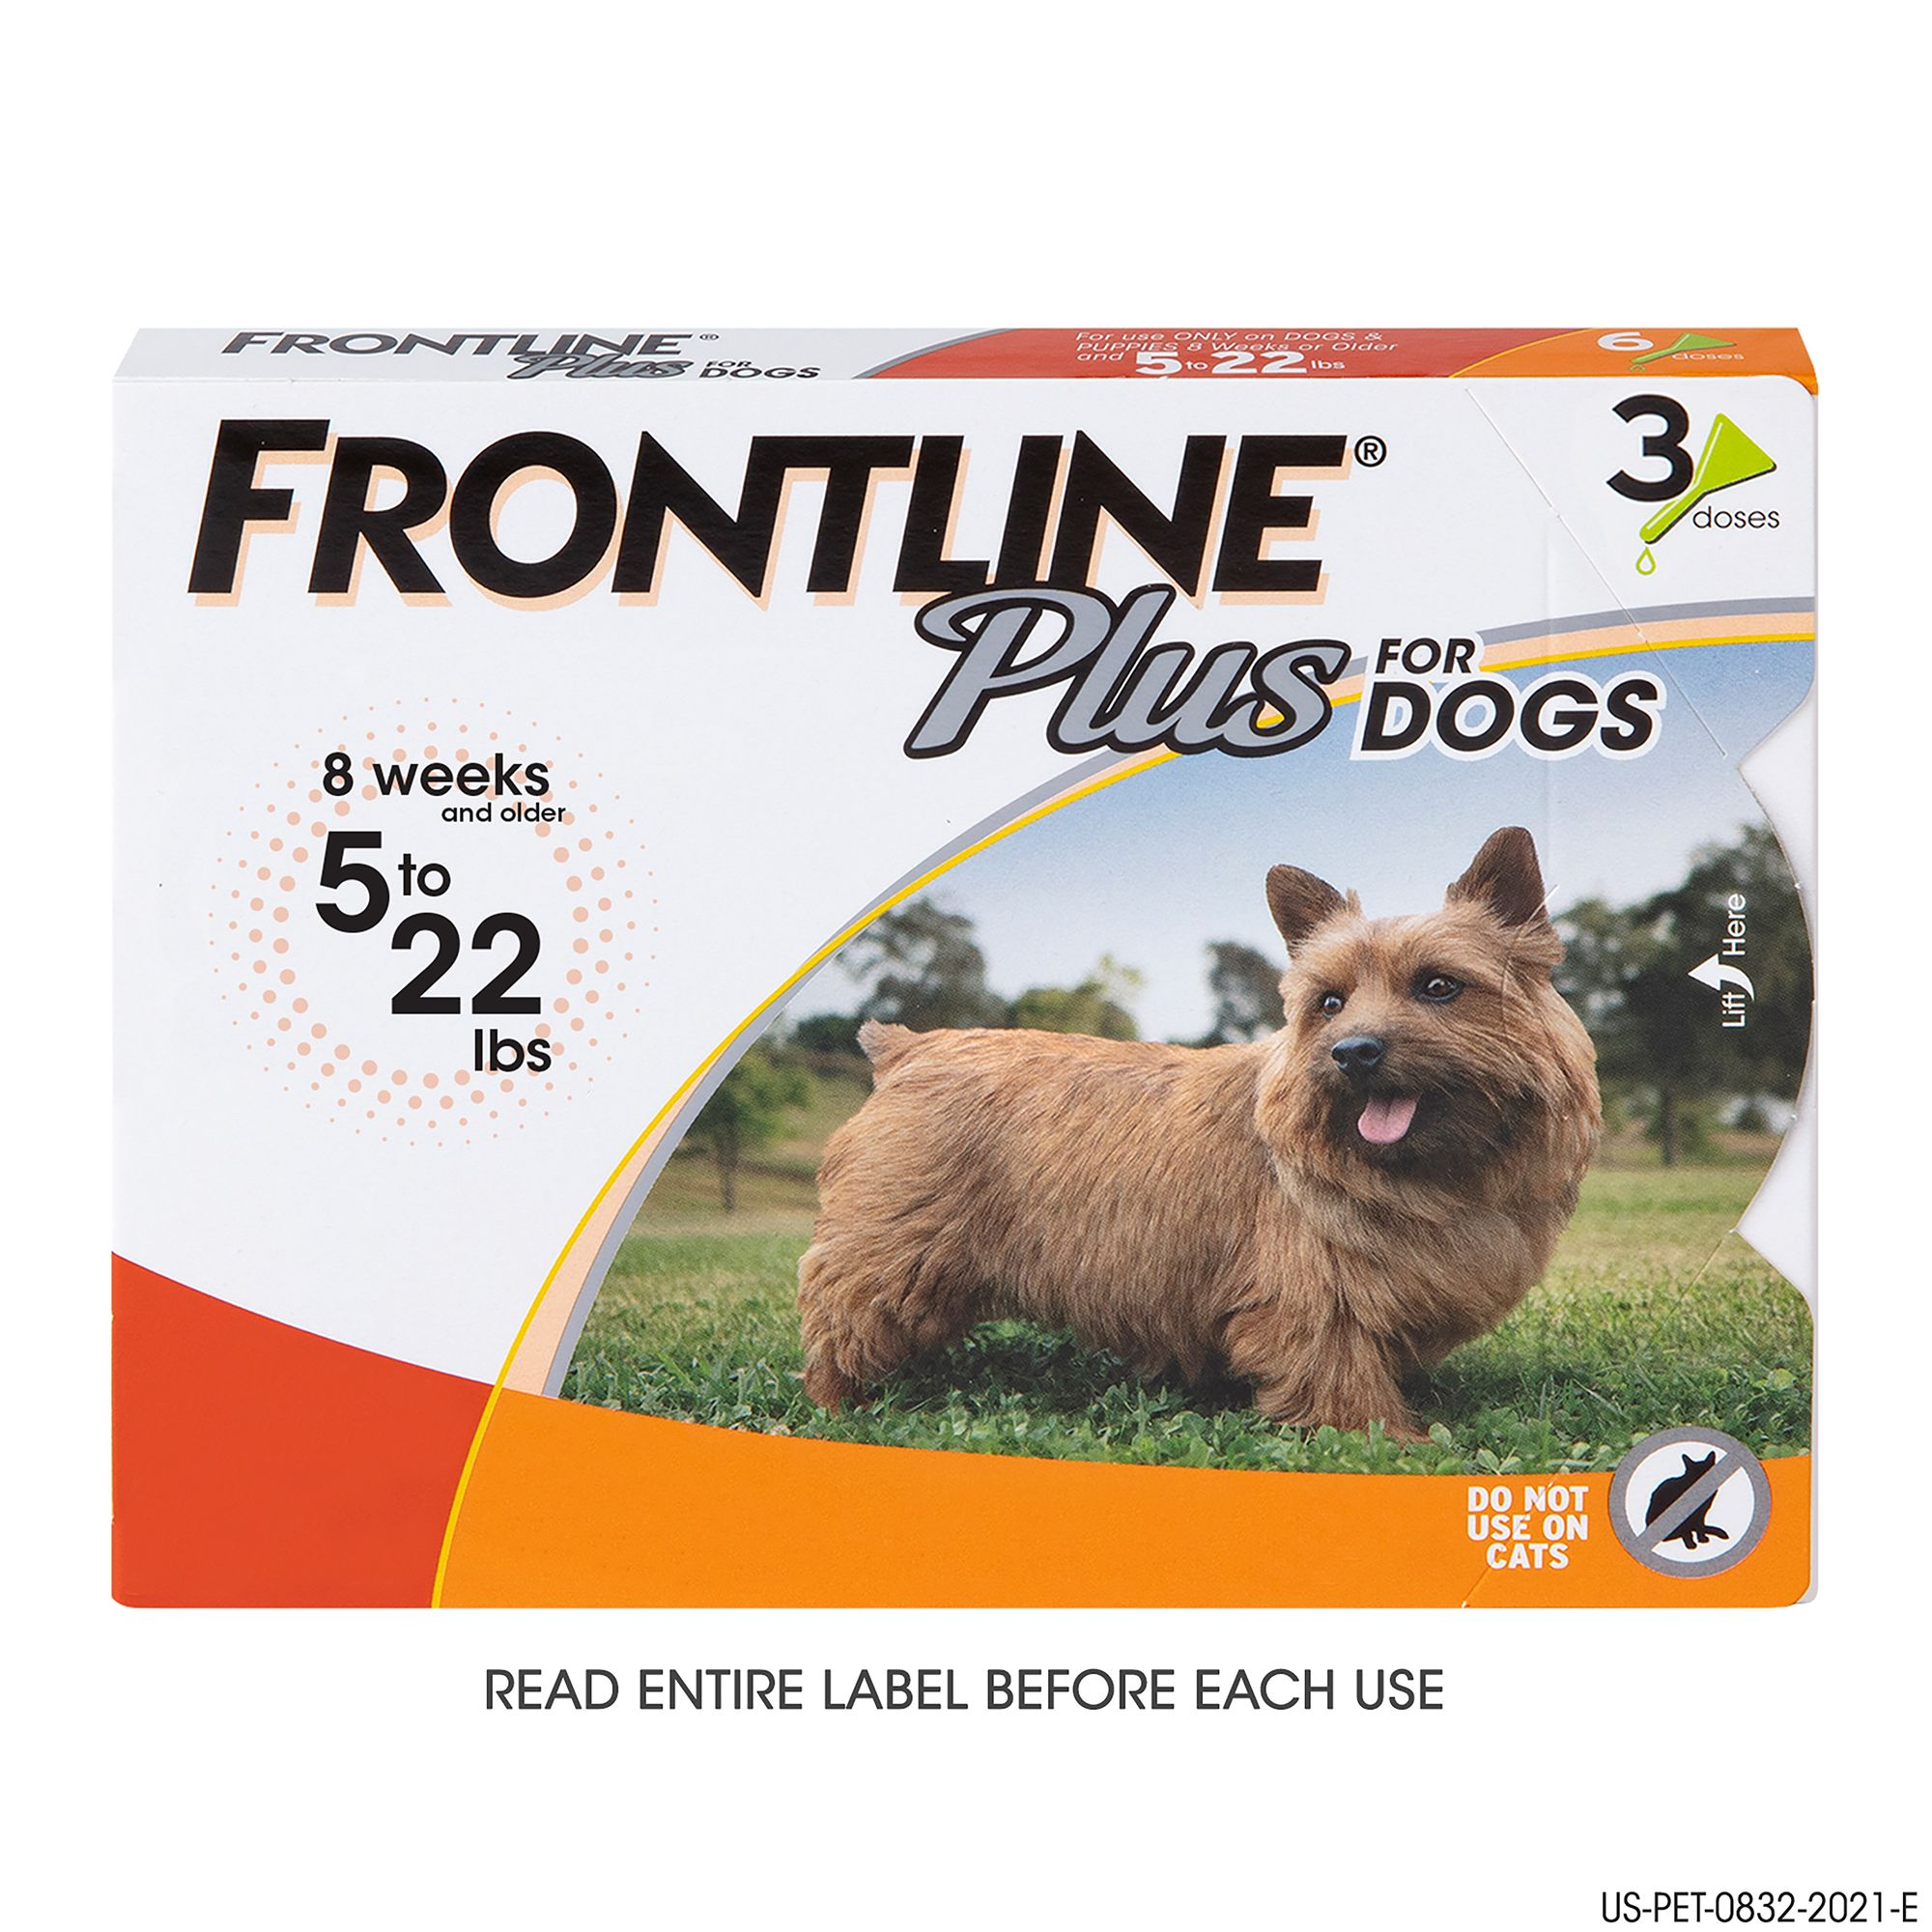 Frontline Plus 5 22 Lb Dog Flea And Tick Treatment Size 3 Count